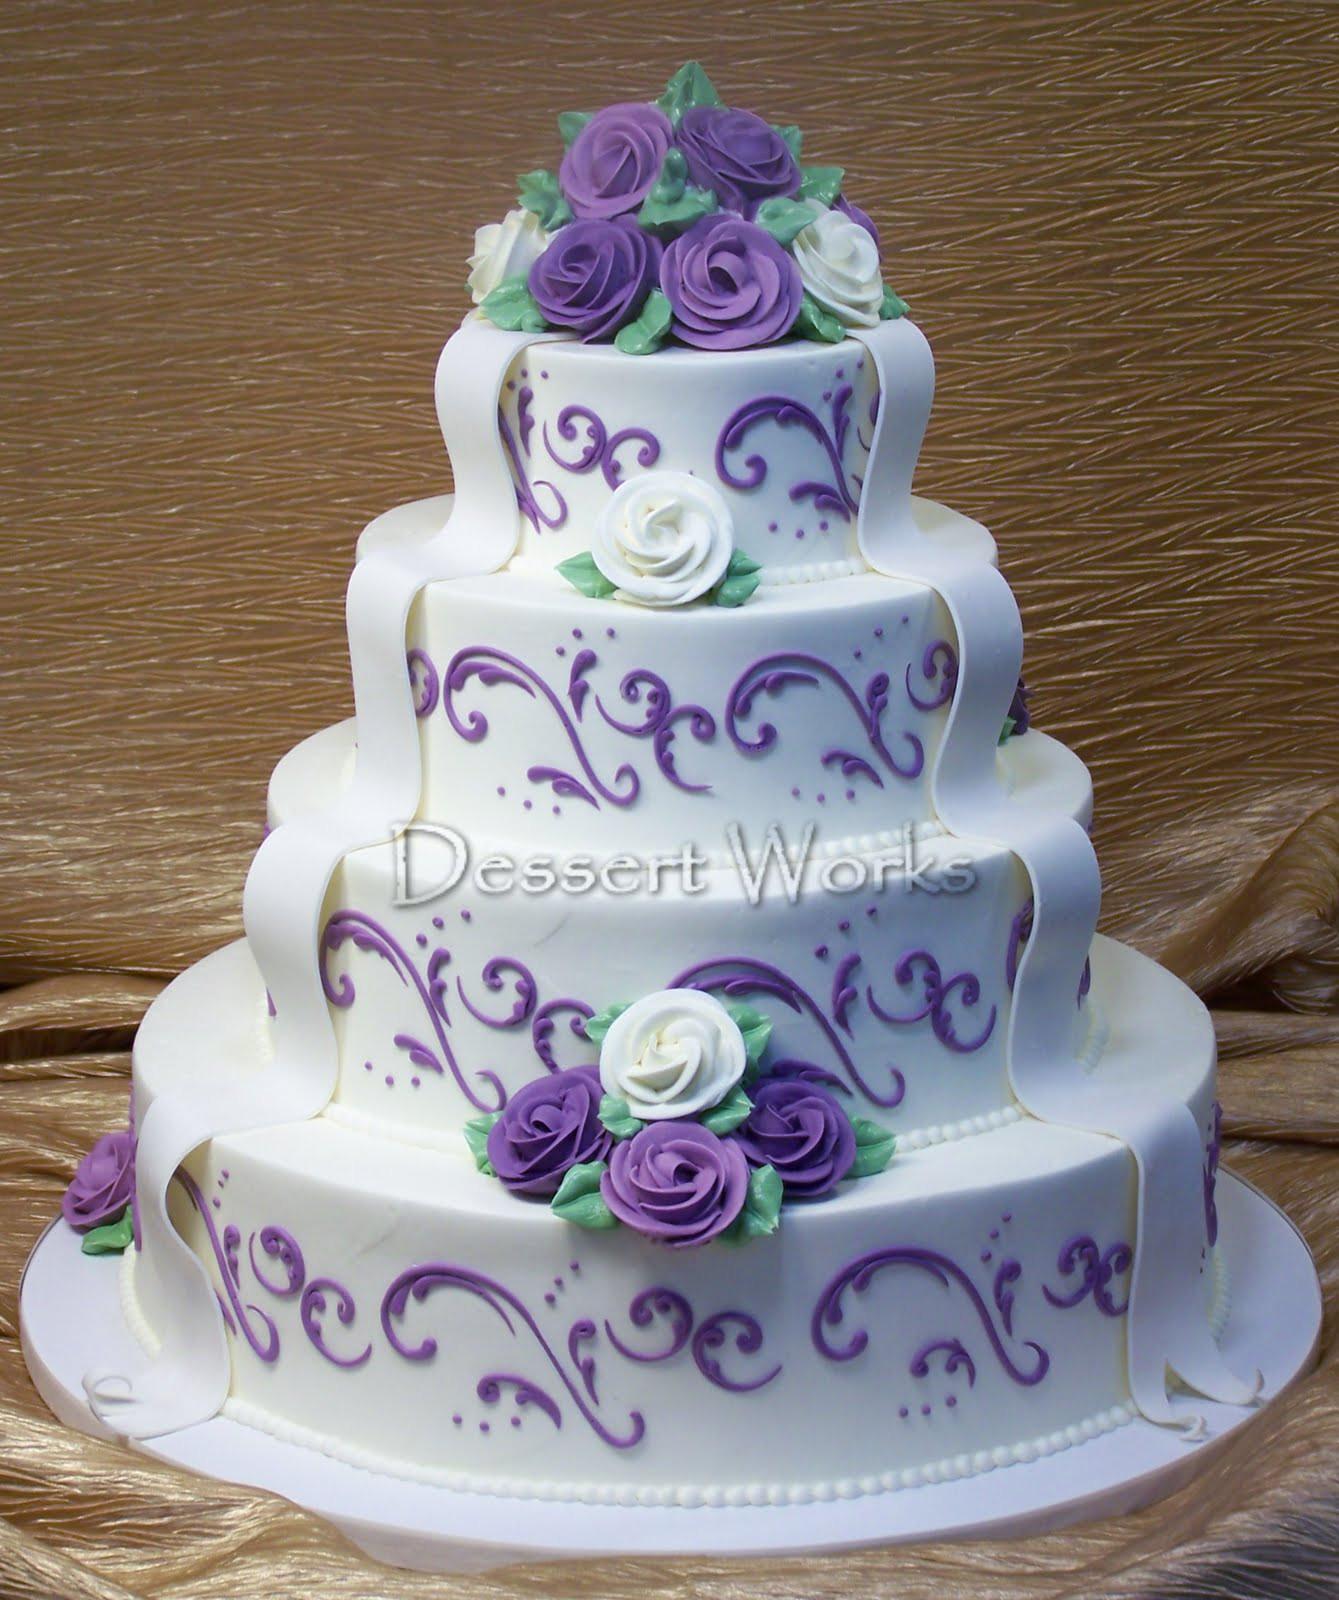 Lavender Wedding Cakes  Dessert Works Bakery July 2010